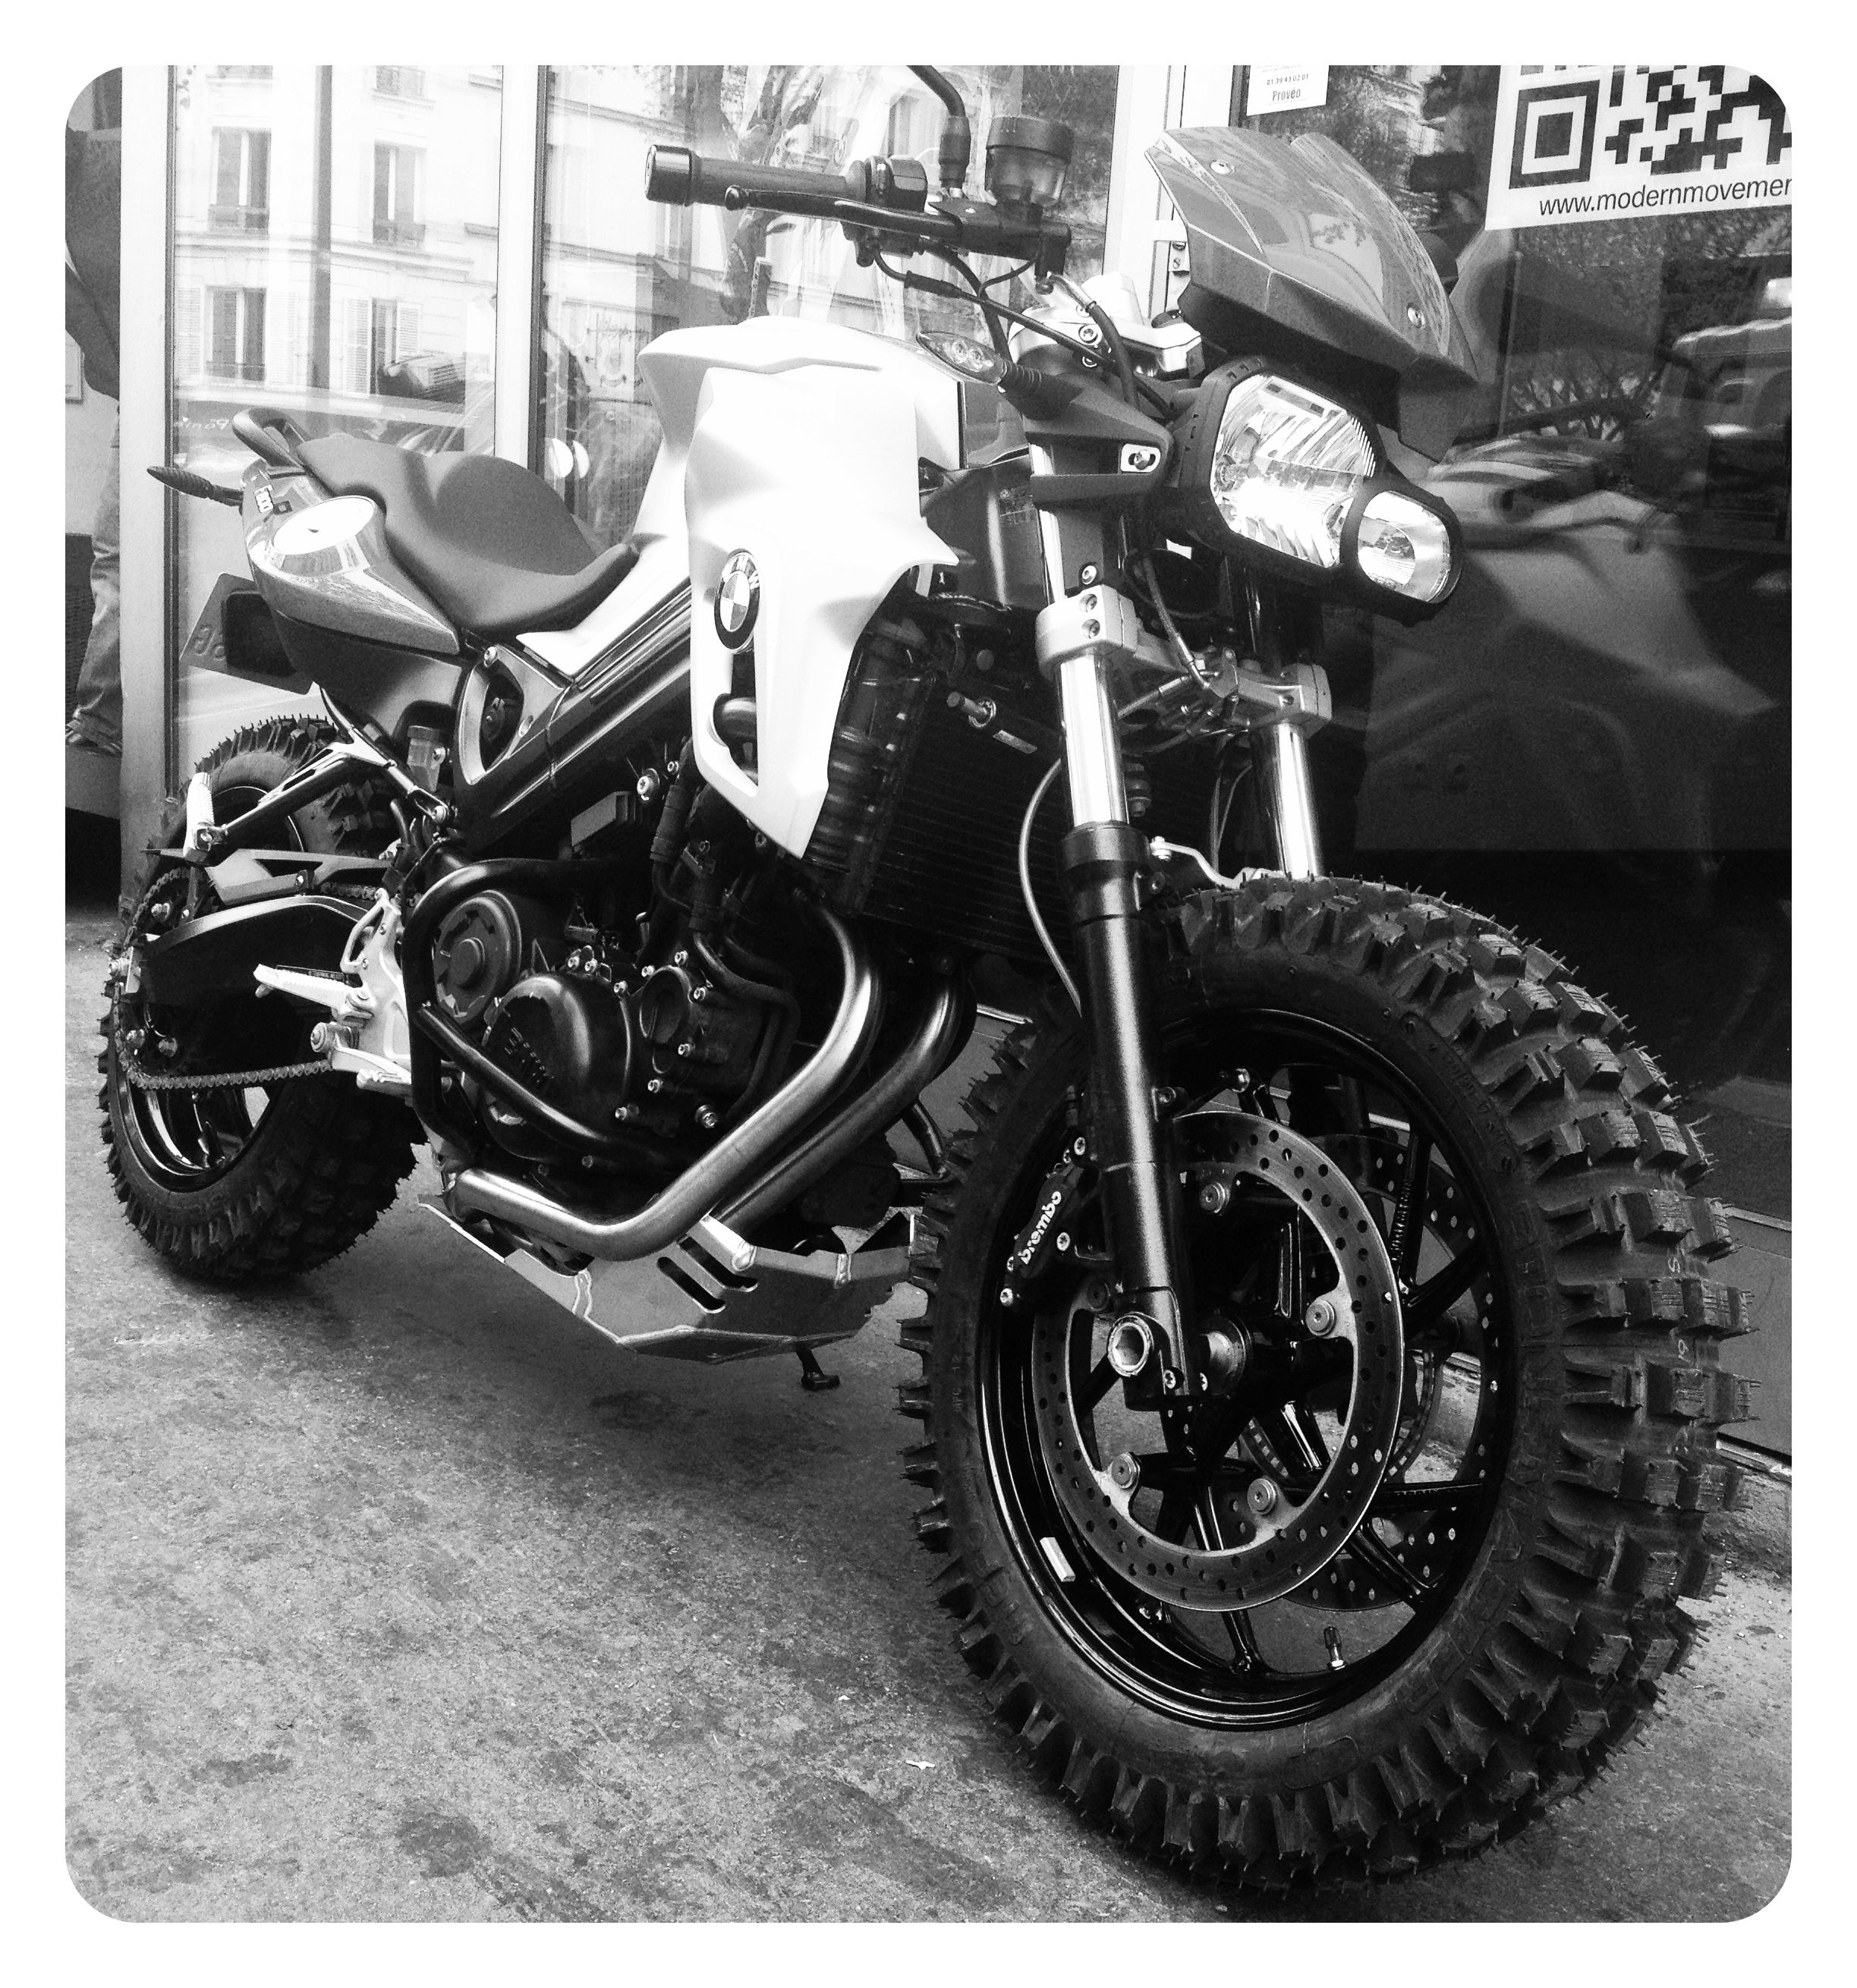 Cars Motorcycles That I Love: Pin De JUAN PABLO SUASTEGUI En Cars & Motorcycles That I